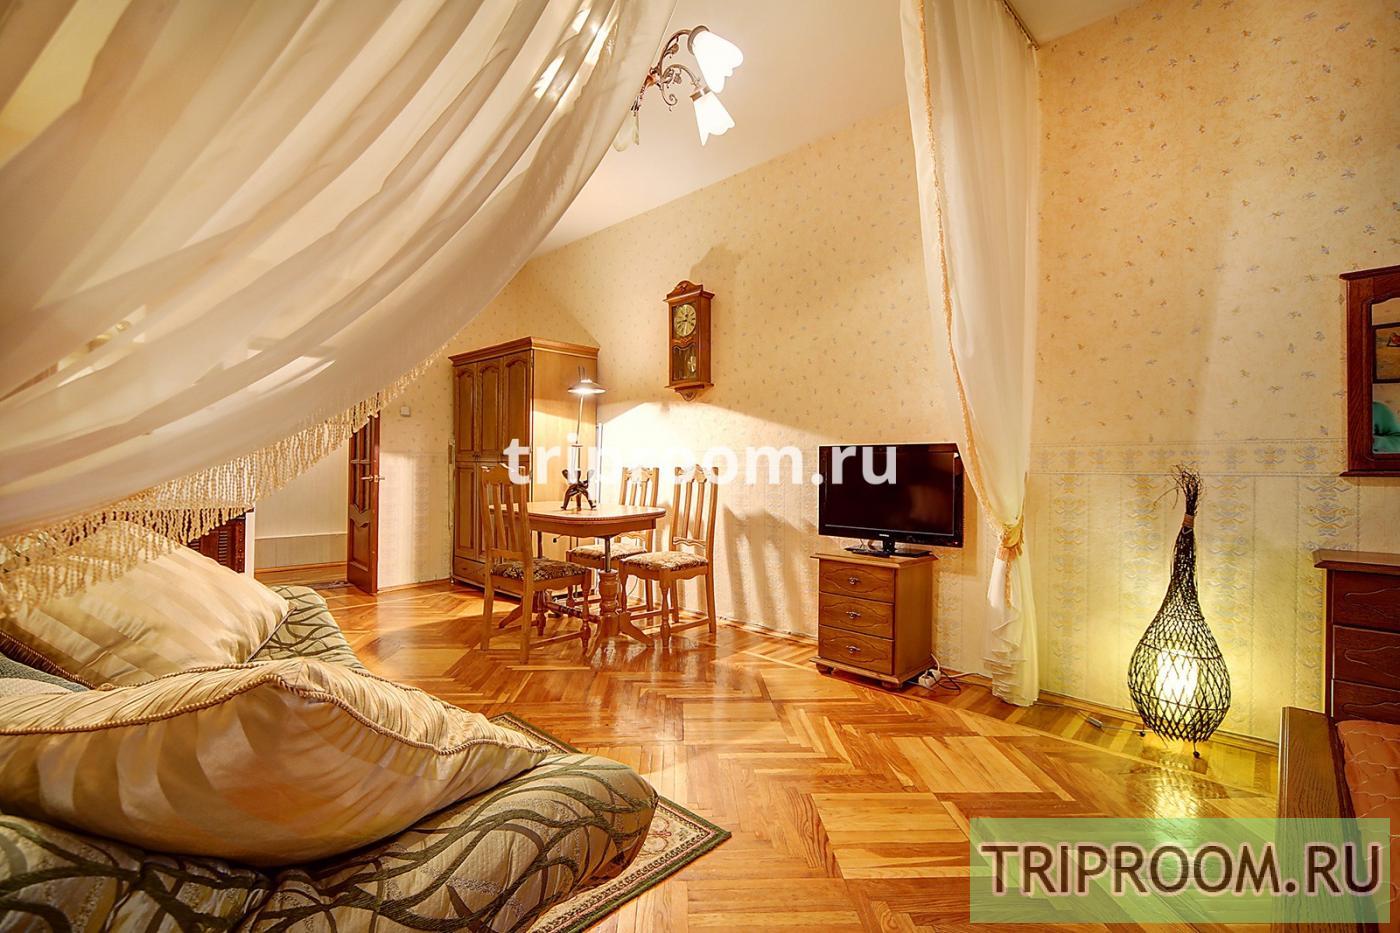 1-комнатная квартира посуточно (вариант № 15445), ул. Лиговский проспект, фото № 8